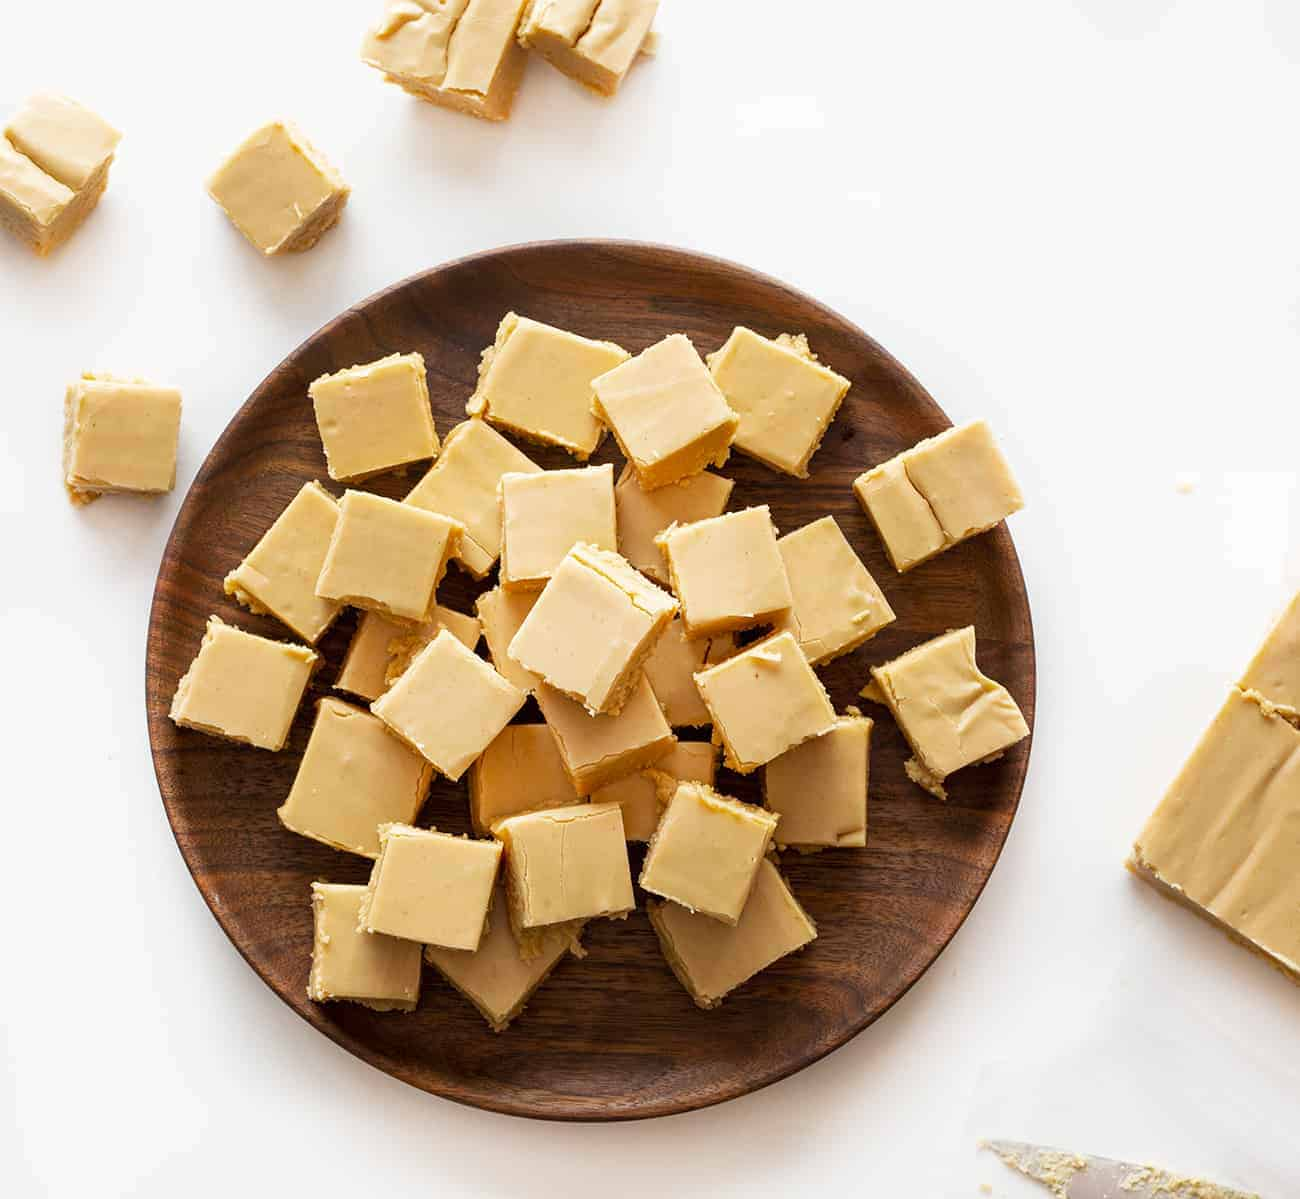 Creamy Peanut Fudge on Wooden Plate